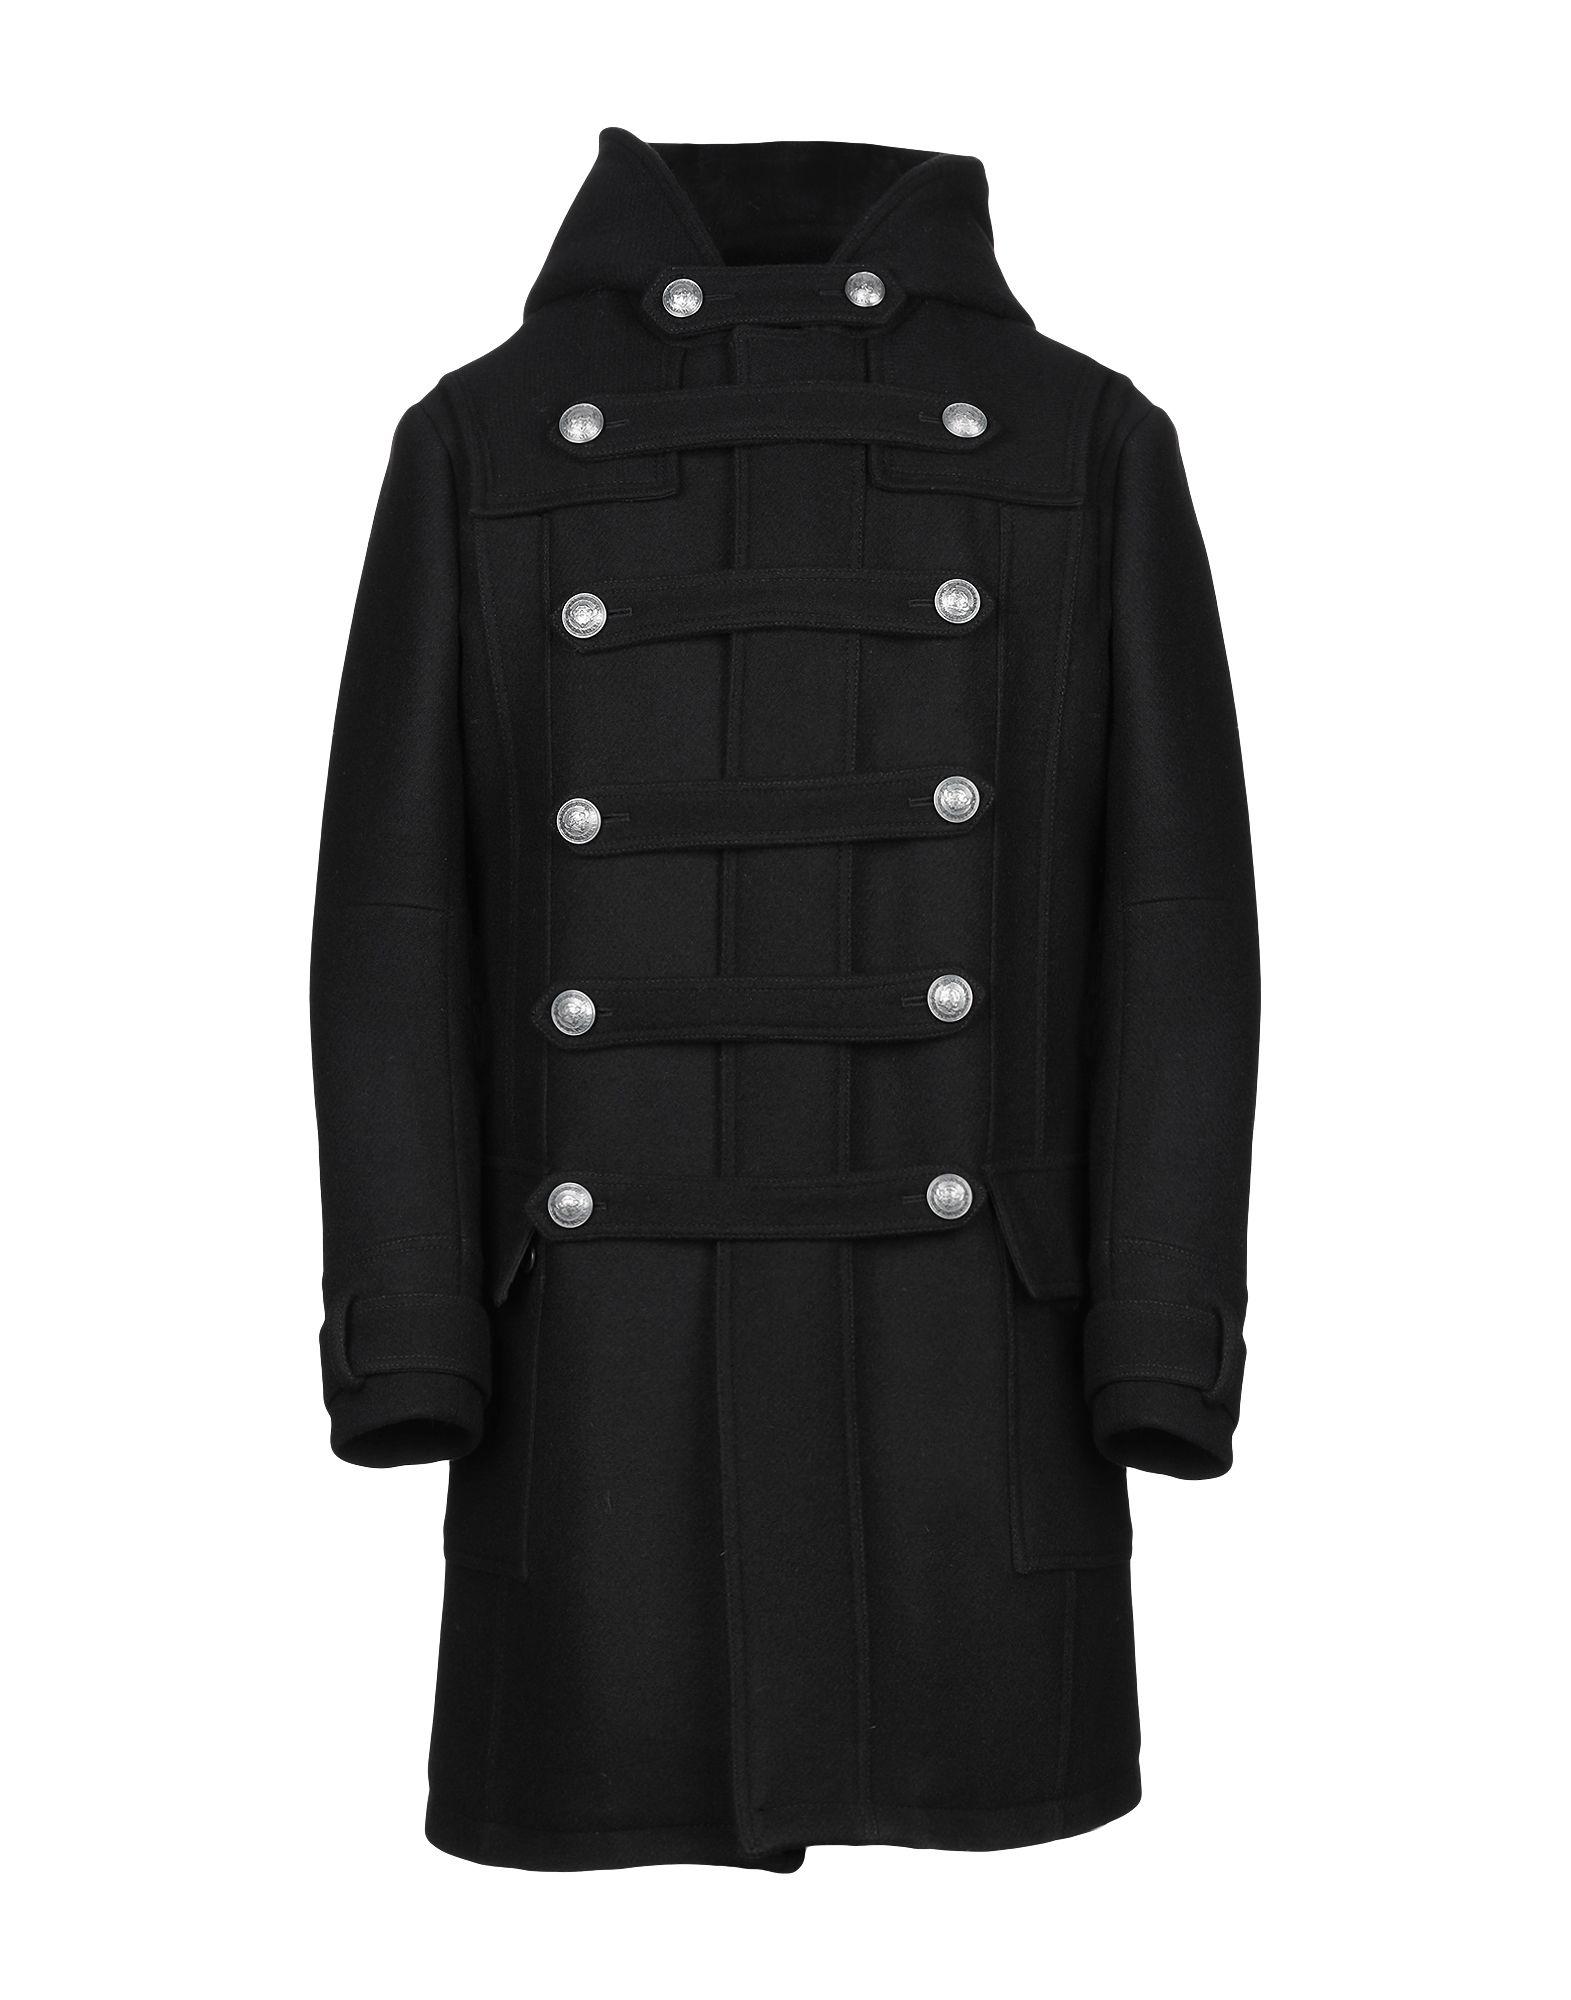 ef3eb8e2bf6 Balmain Coat - Men Balmain Coats online on YOOX Portugal - 41882250EE